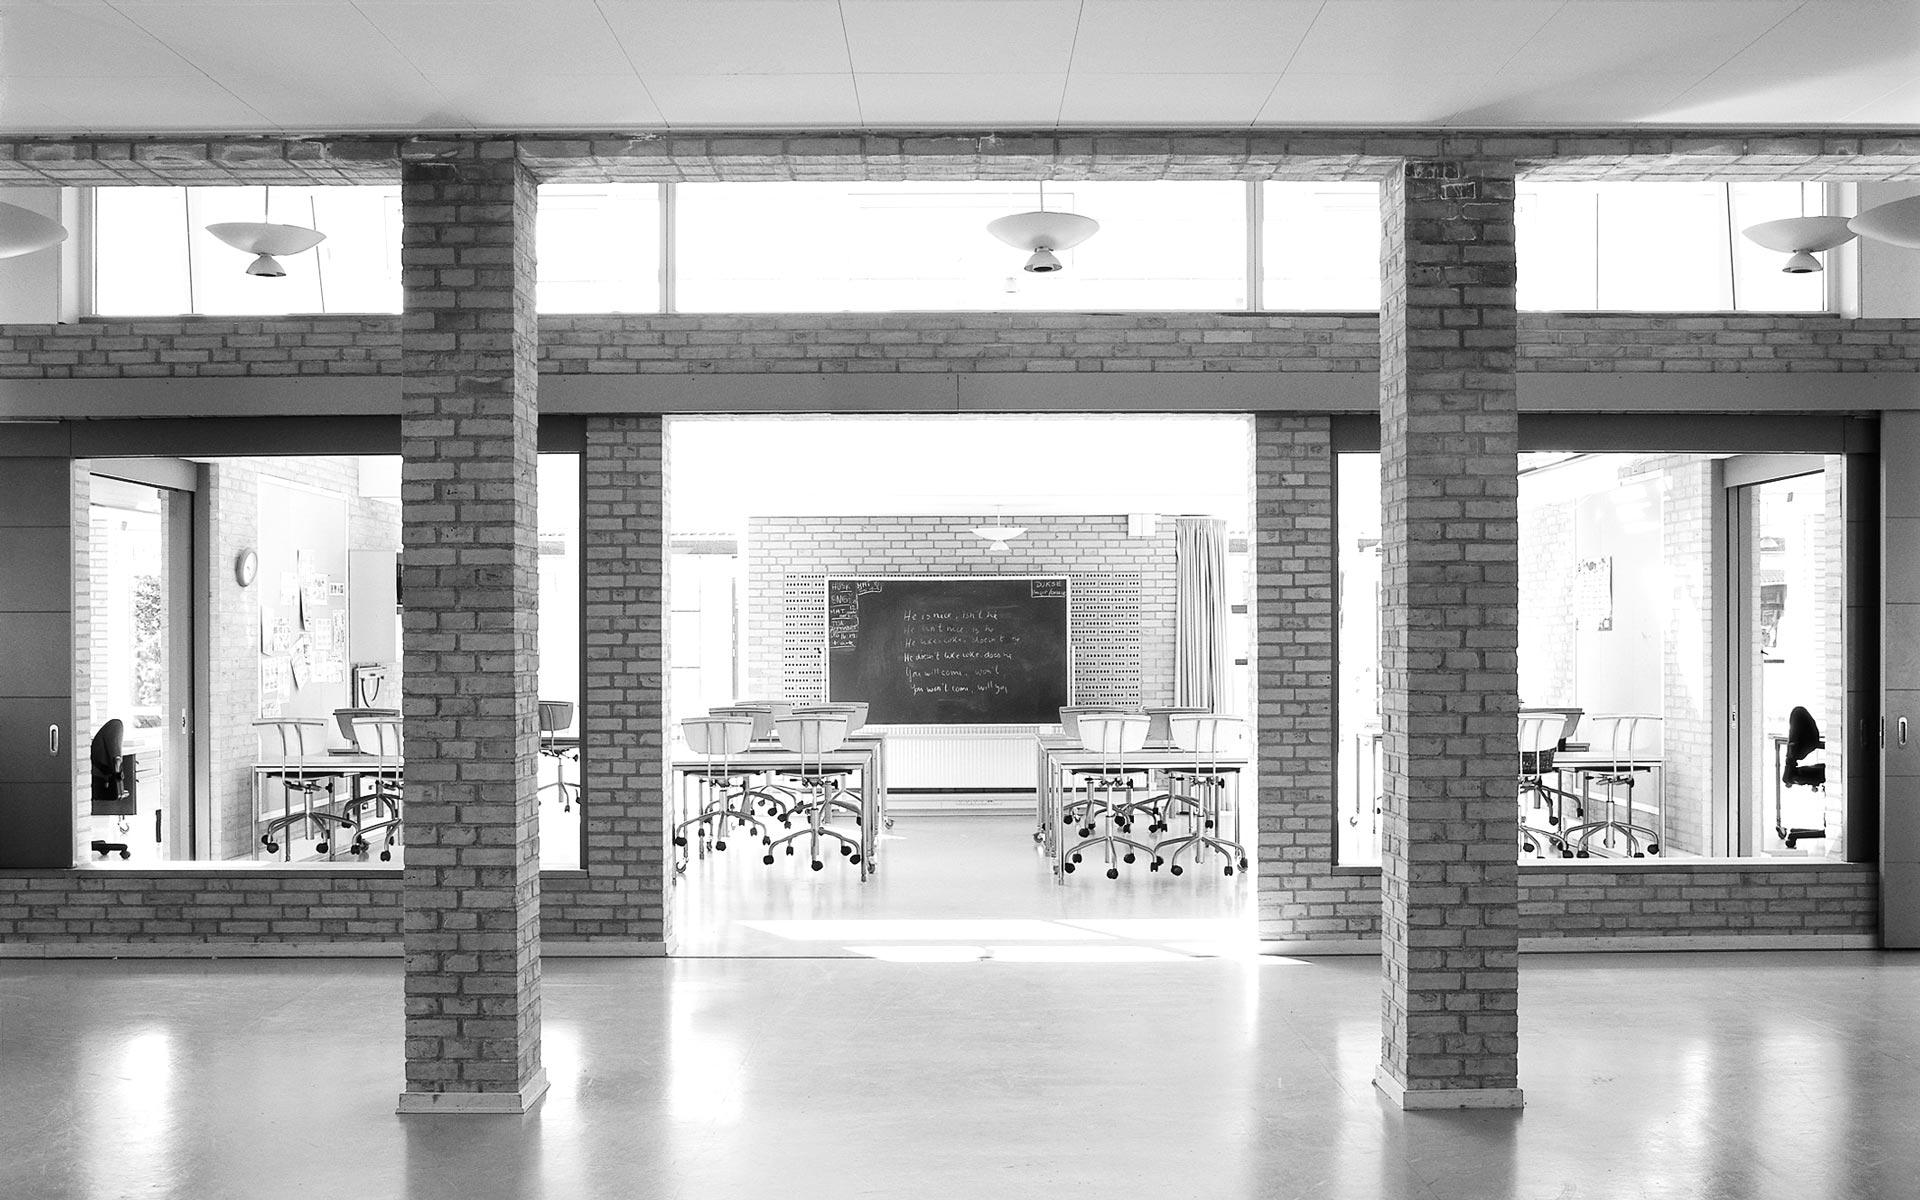 BG-Ronbaekskolen